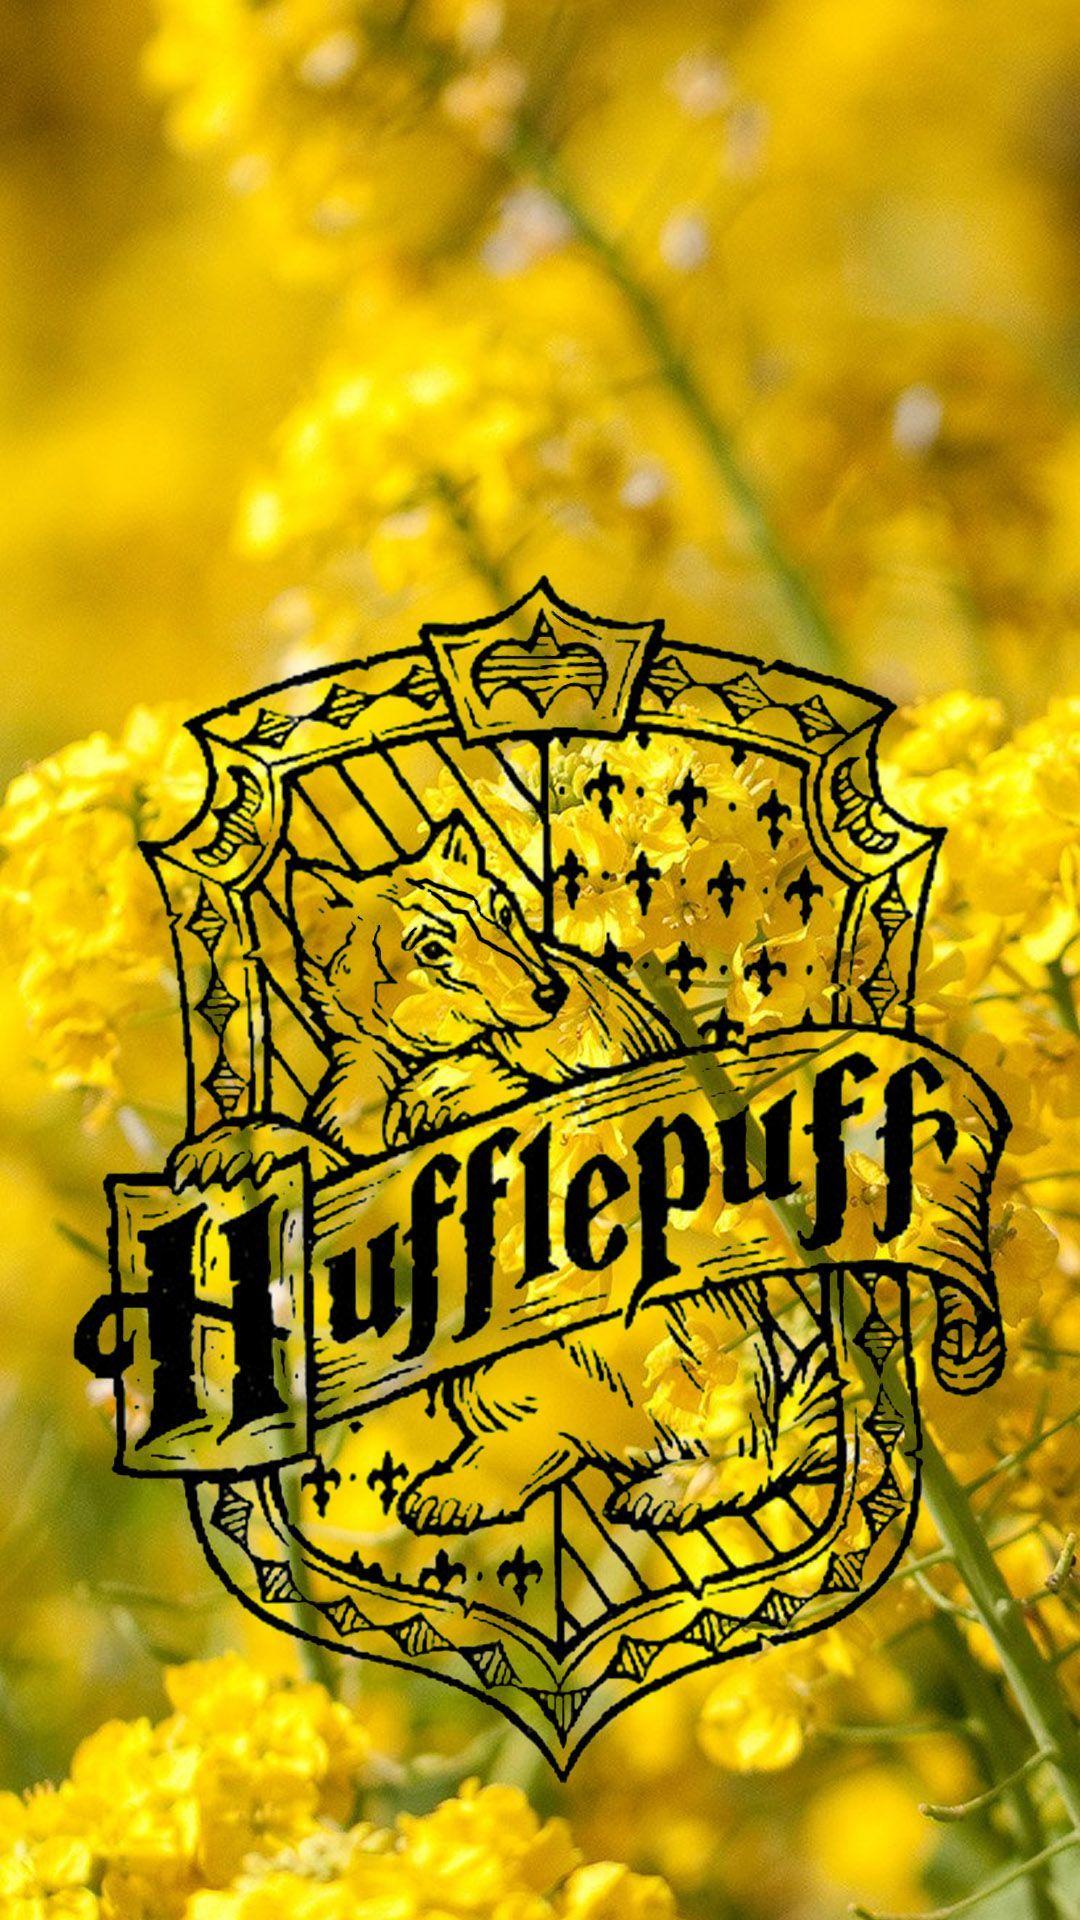 Harry Potter Hufflepuff Wallpaper Hupages Download Iphone Wallpapers Harry Potter Wallpaper Hufflepuff Wallpaper Harry Potter Background